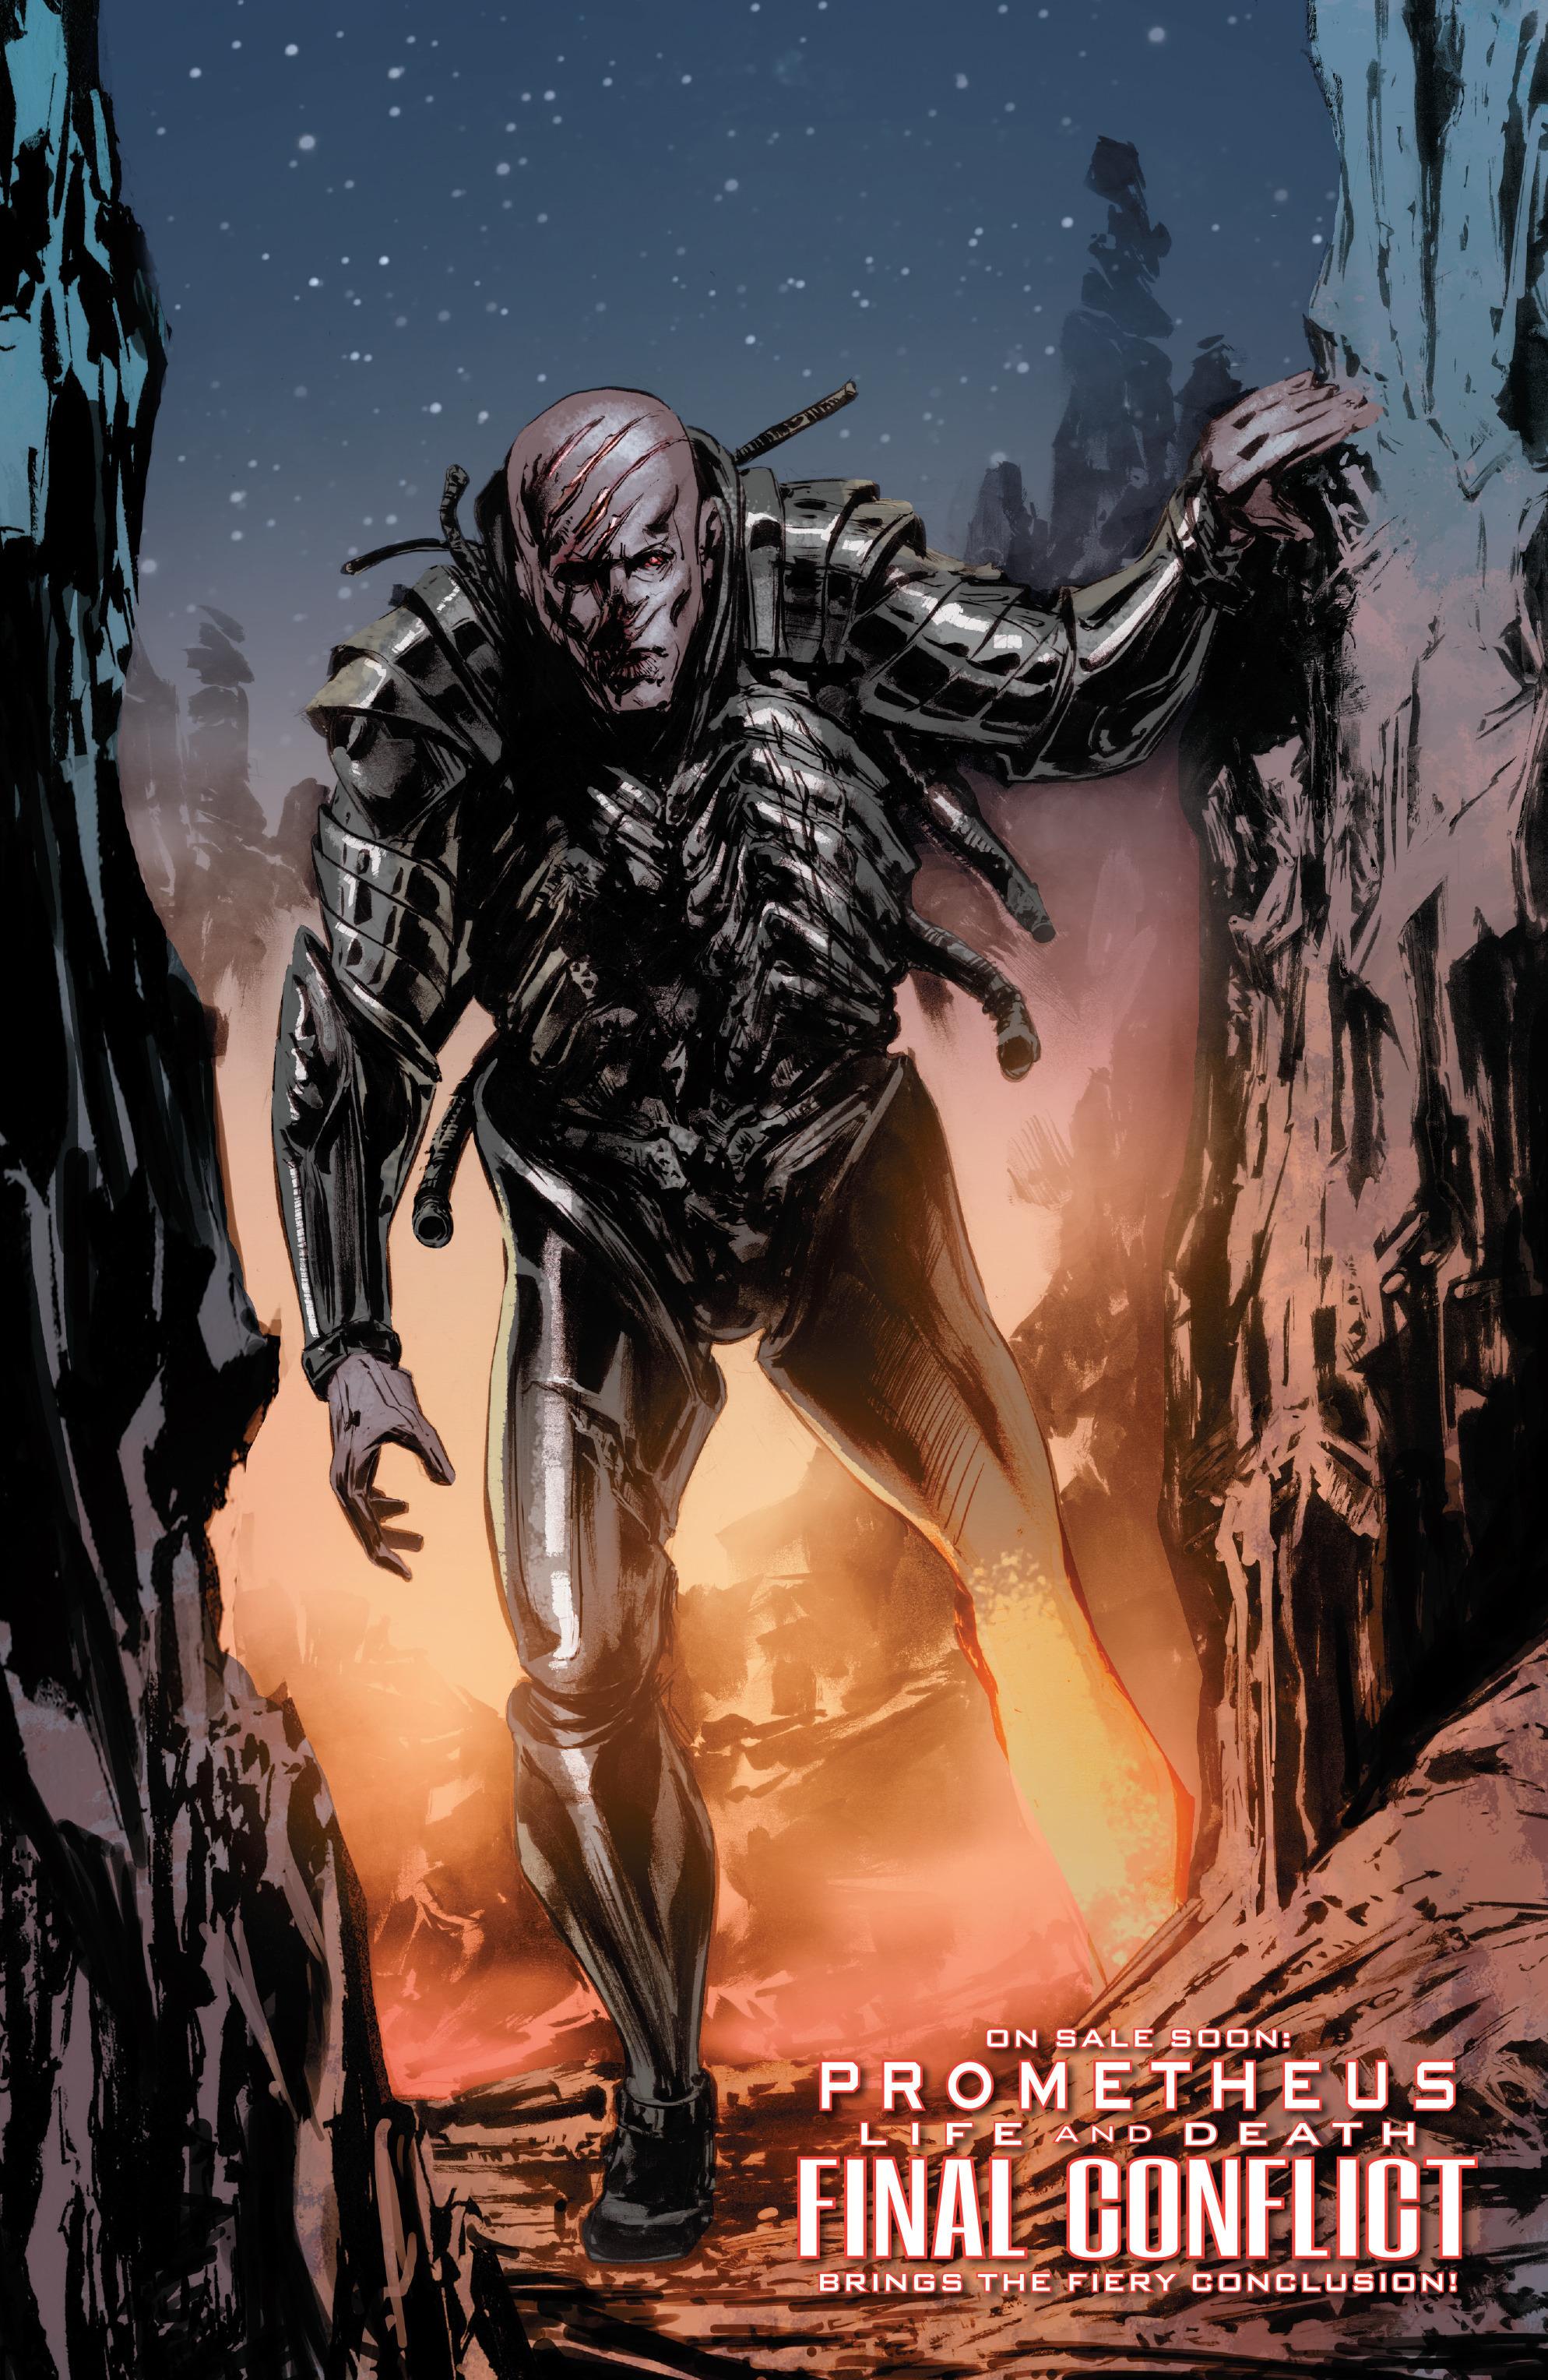 Drawn predator engineer Large Halo and slashing fight